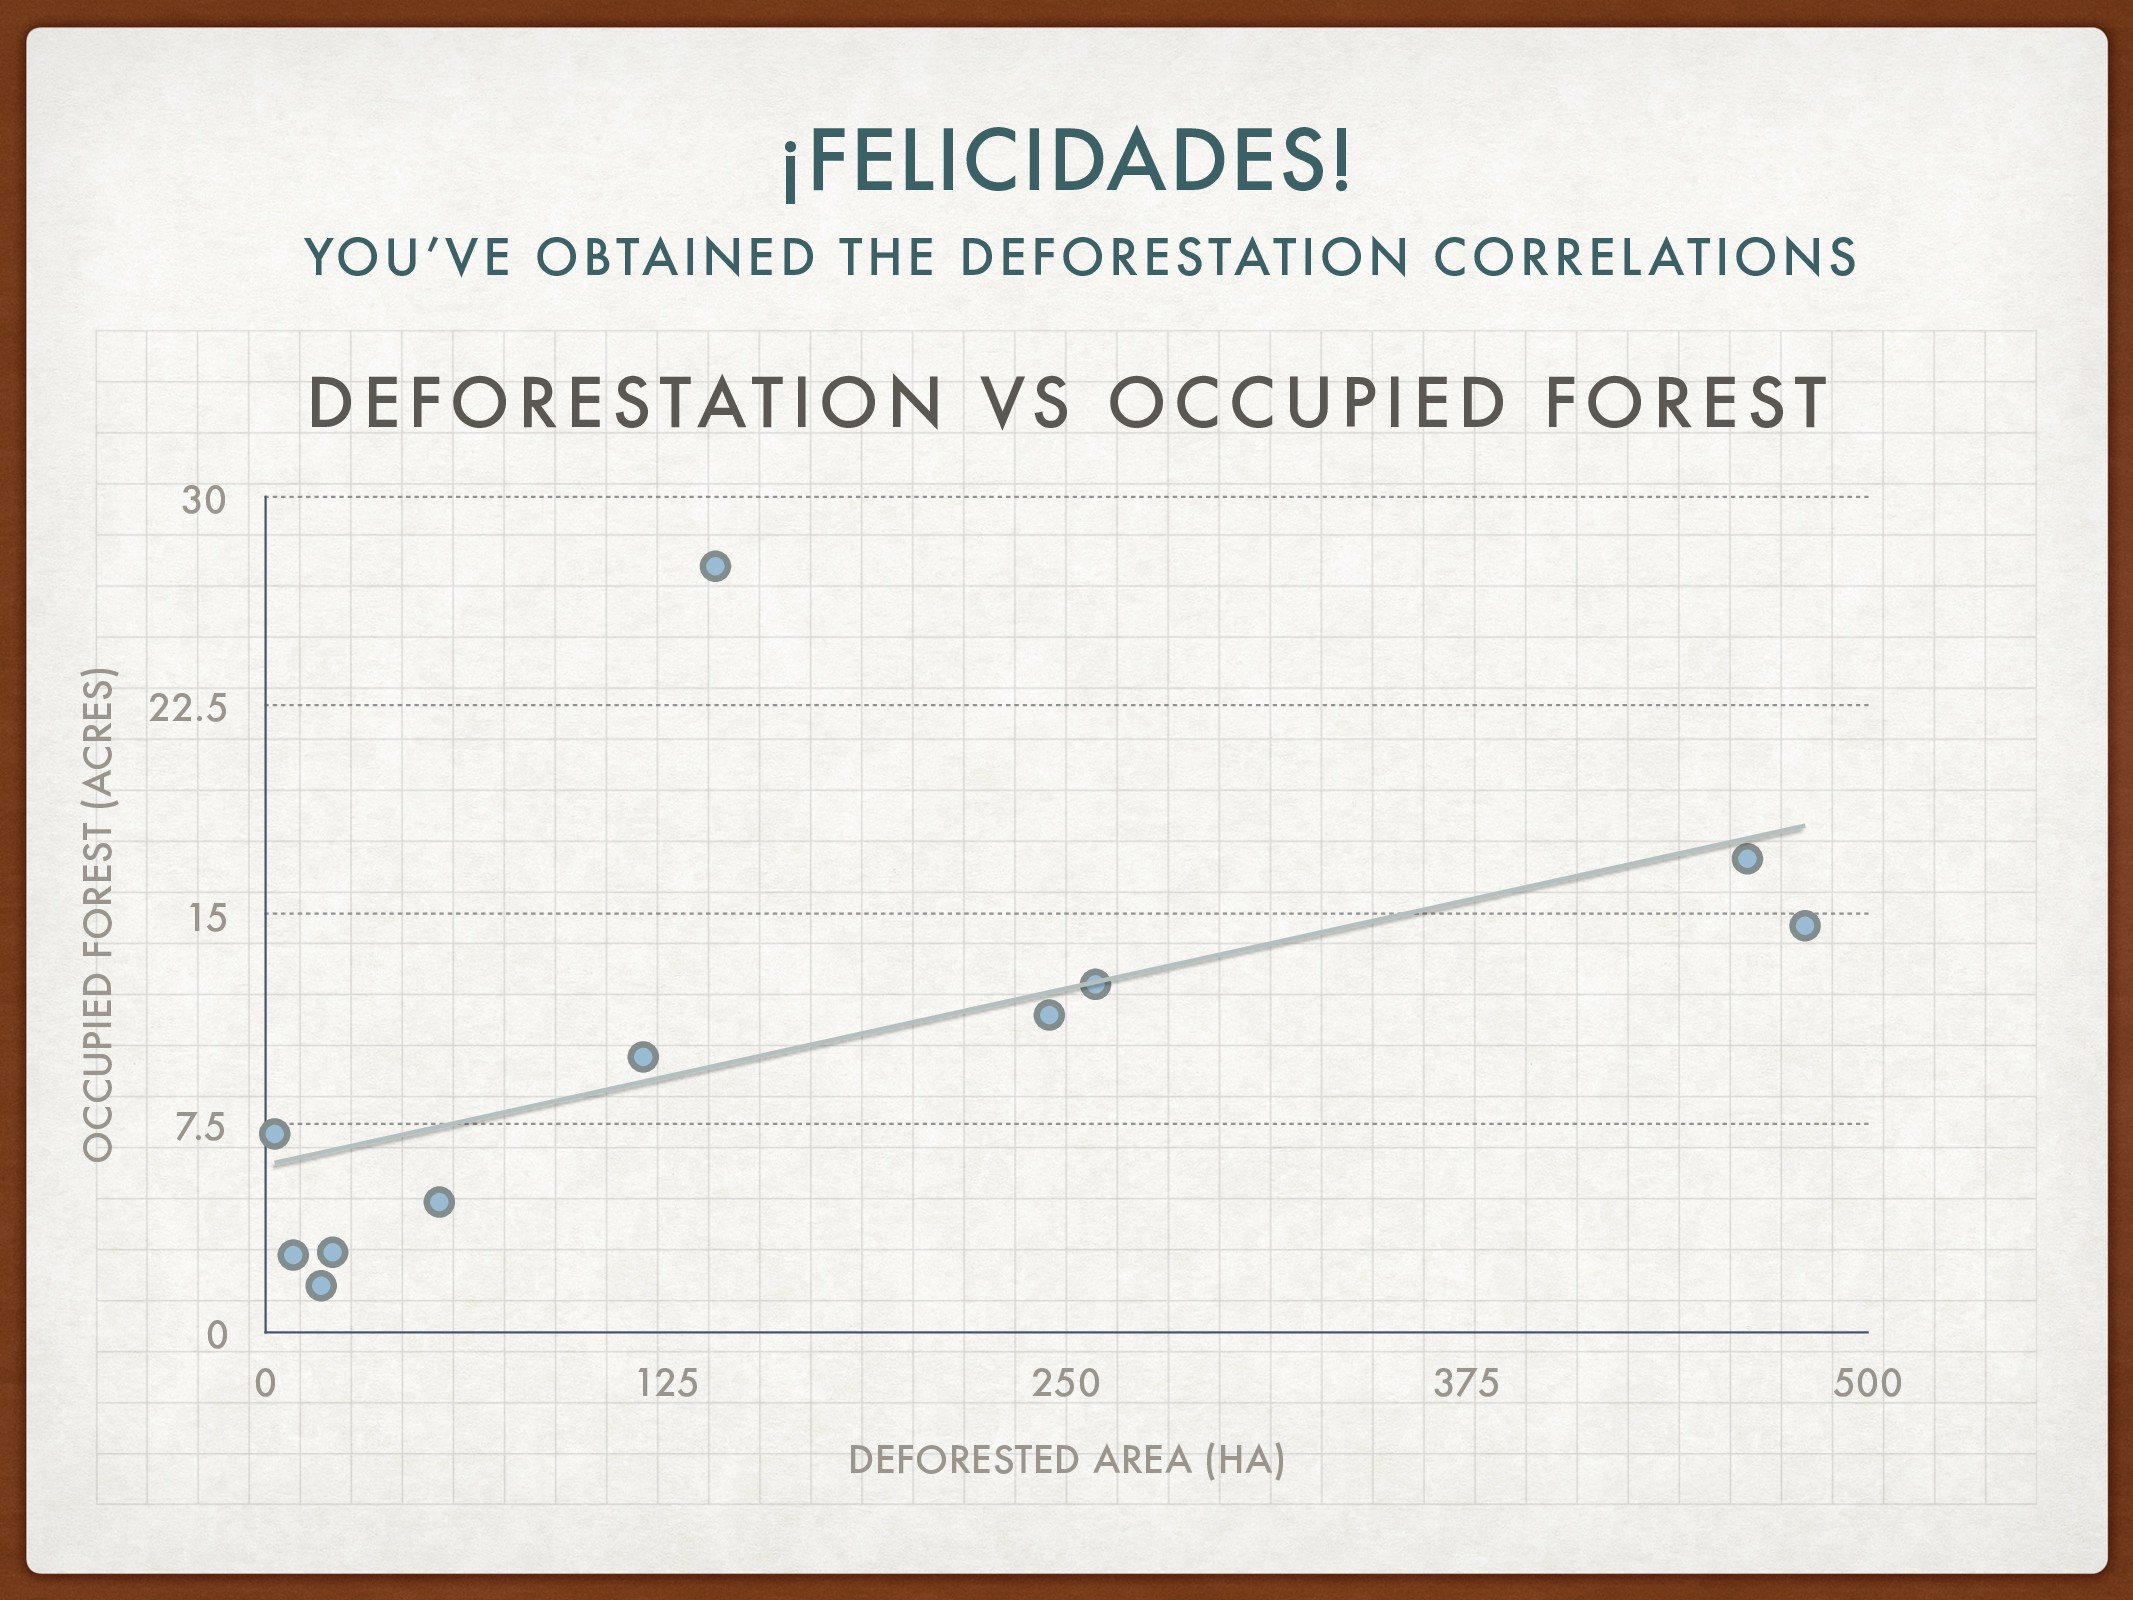 ¡FELICIDADES! YOU'VE OBTAINED THE DEFORESTATION...